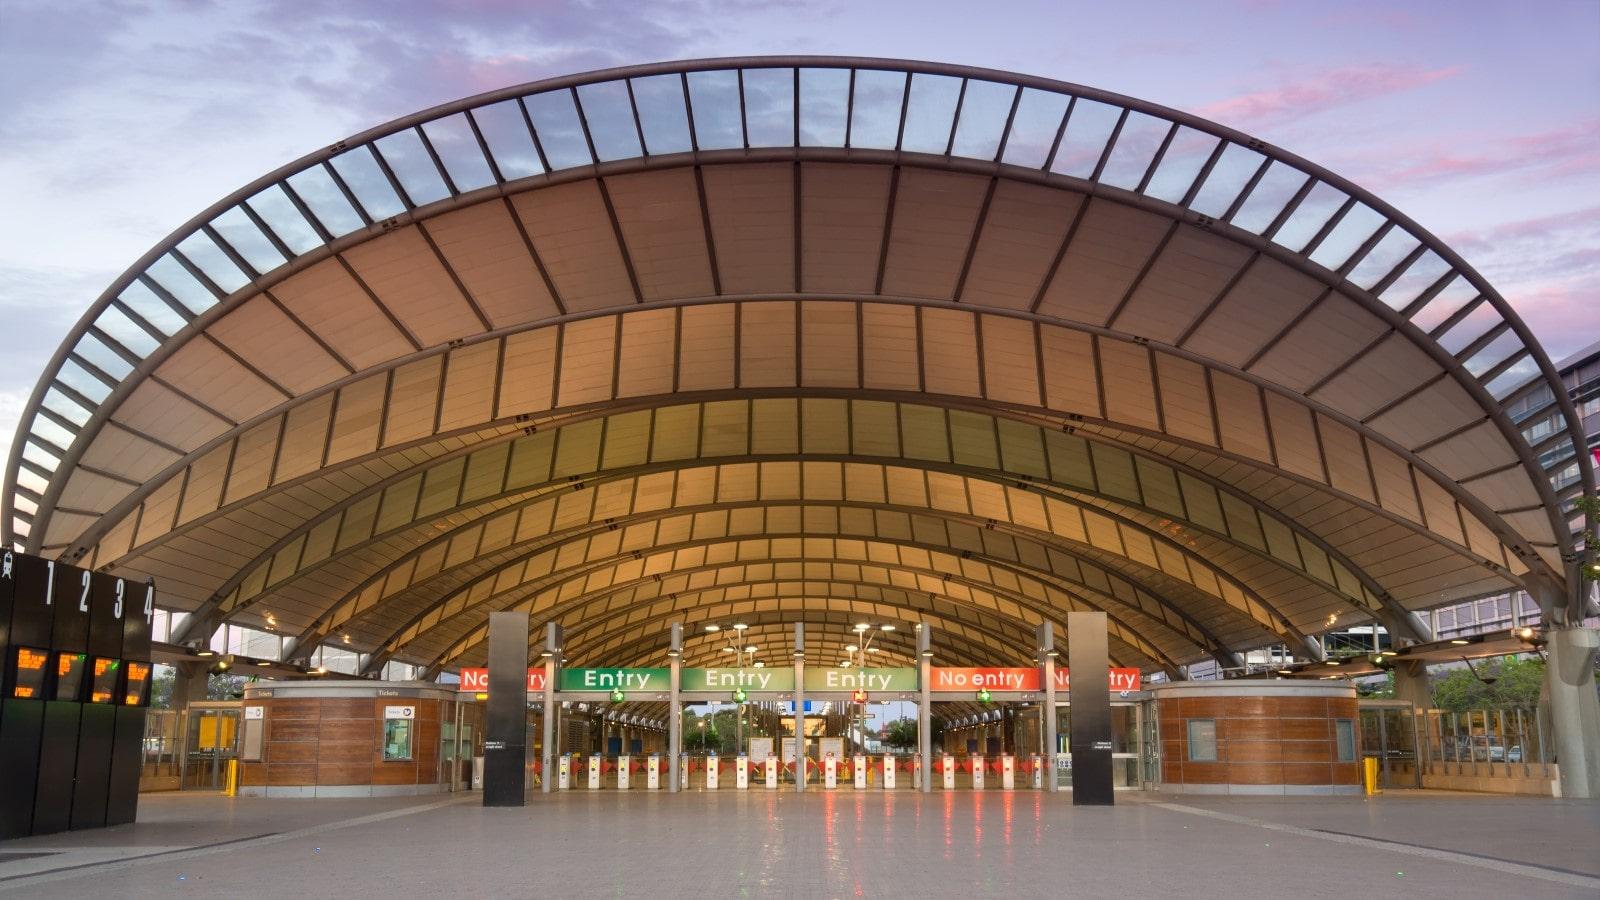 The modern train station at Sydney Olympic Park, seen at dusk under a colourful sky.